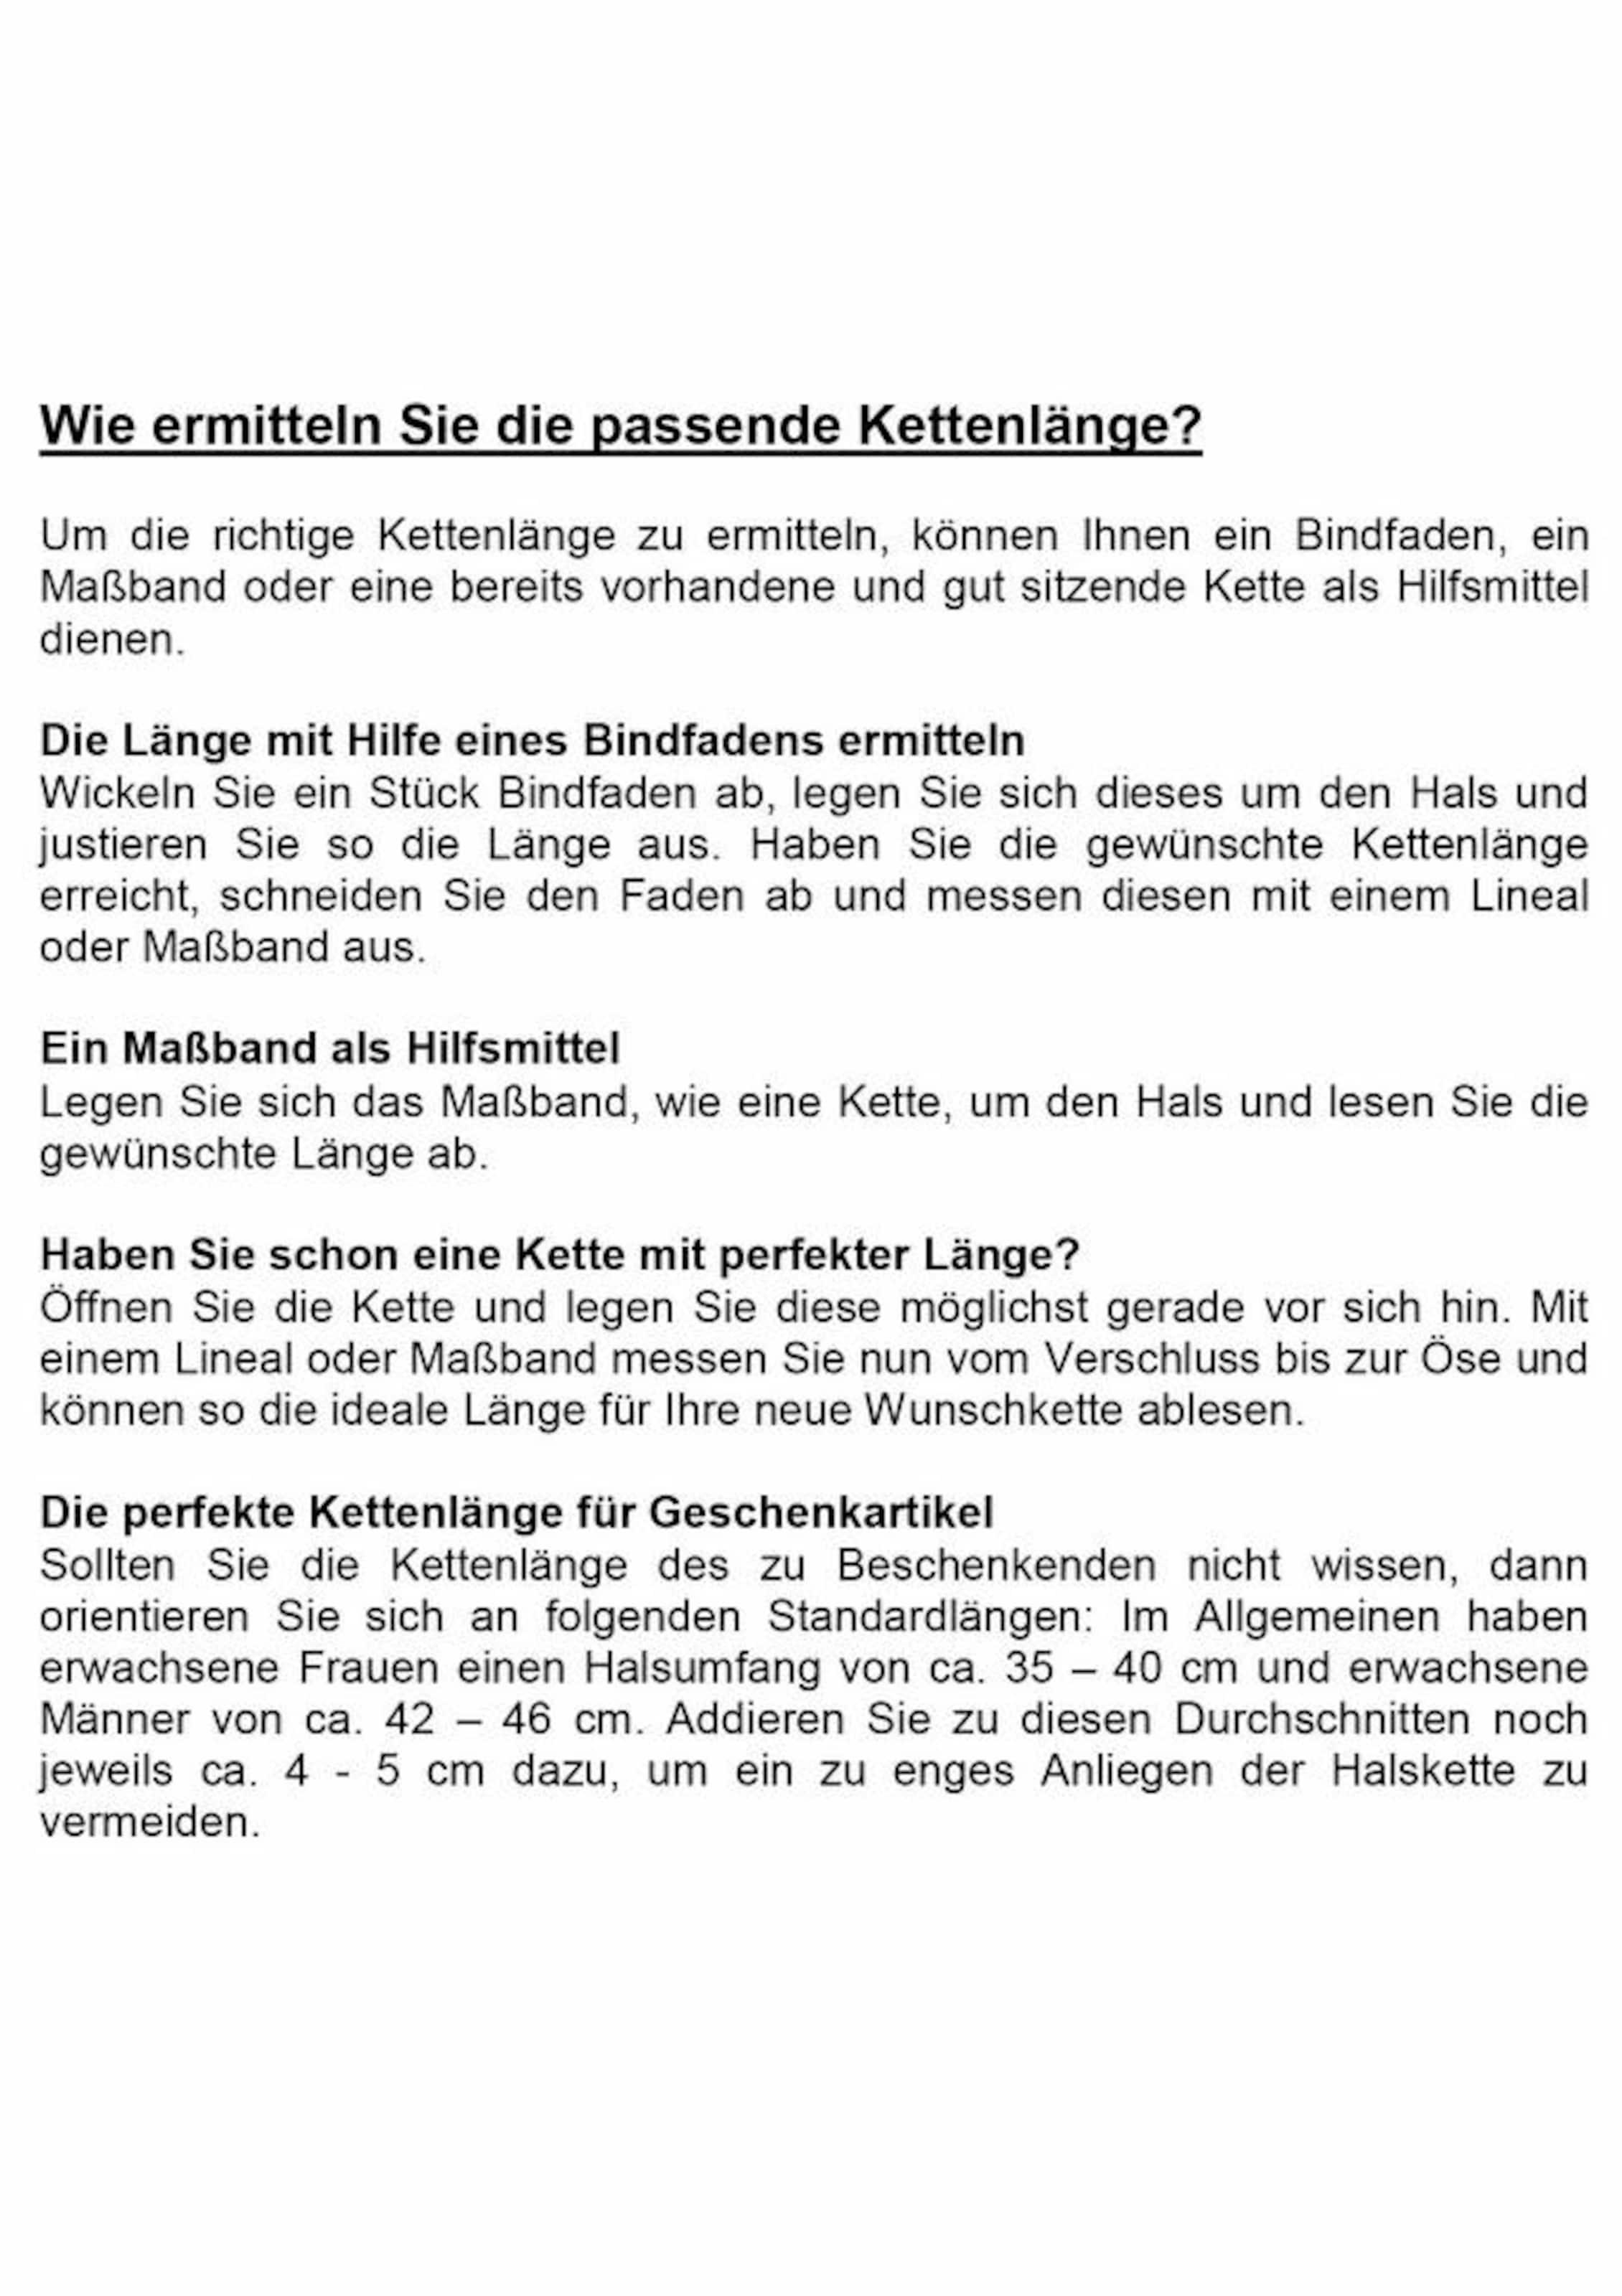 VIVANCE Vivance jewels Kettenanhänger »Kleeblatt« Auslass Offizielle Seite Erstaunlicher Preis Zu Verkaufen Klassisch Outlet Top-Qualität LmSXs01